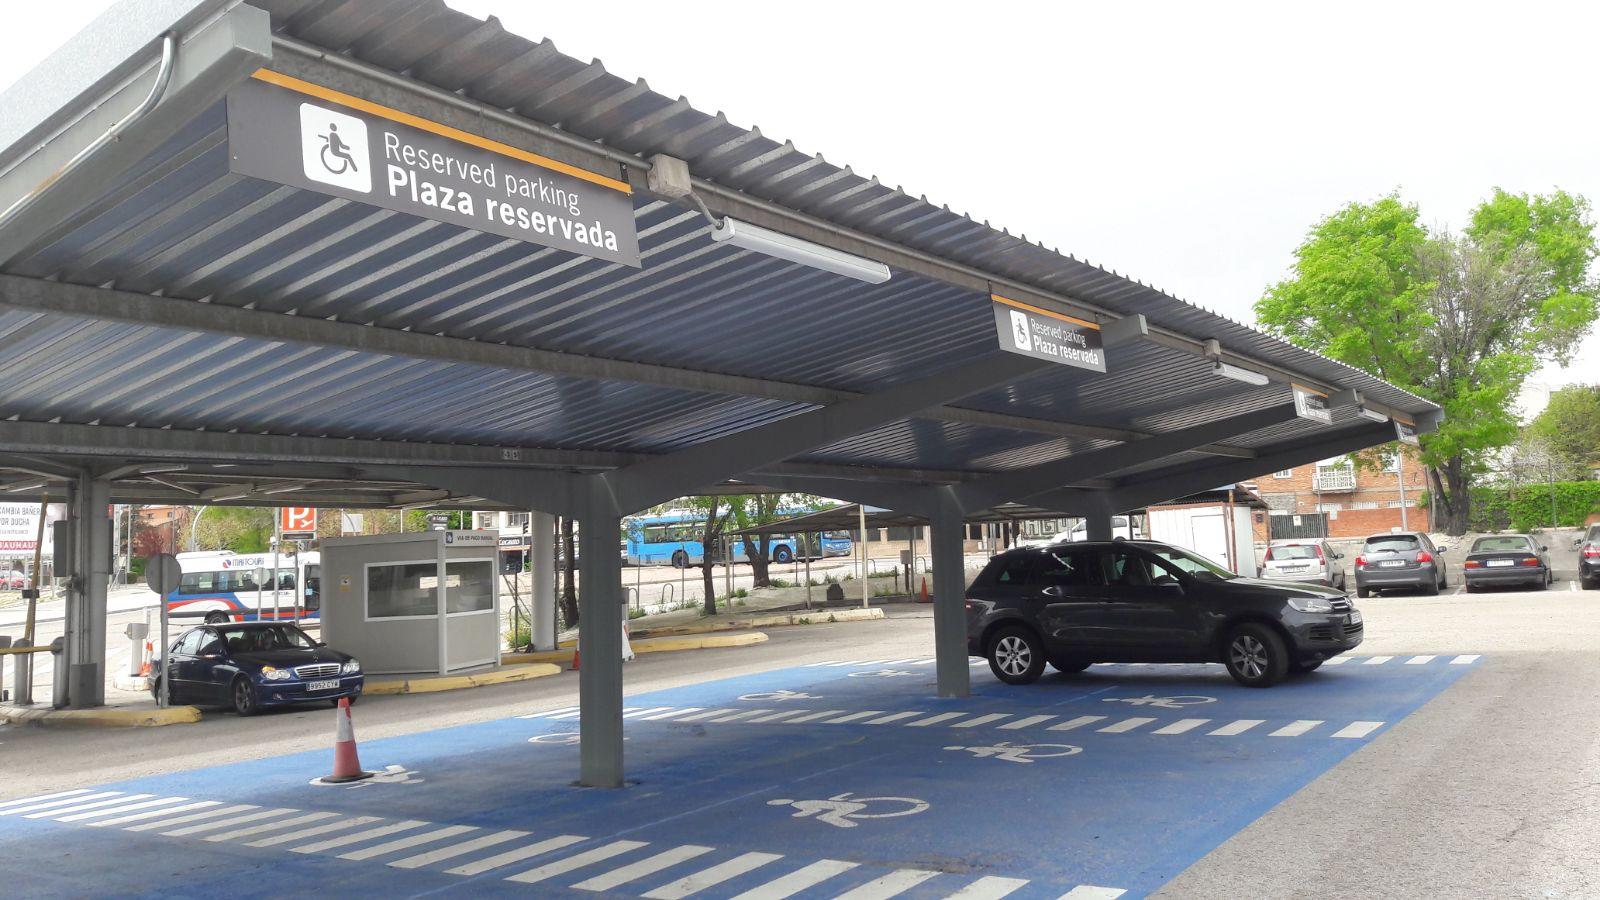 Parking zona reservada en aeropuerto